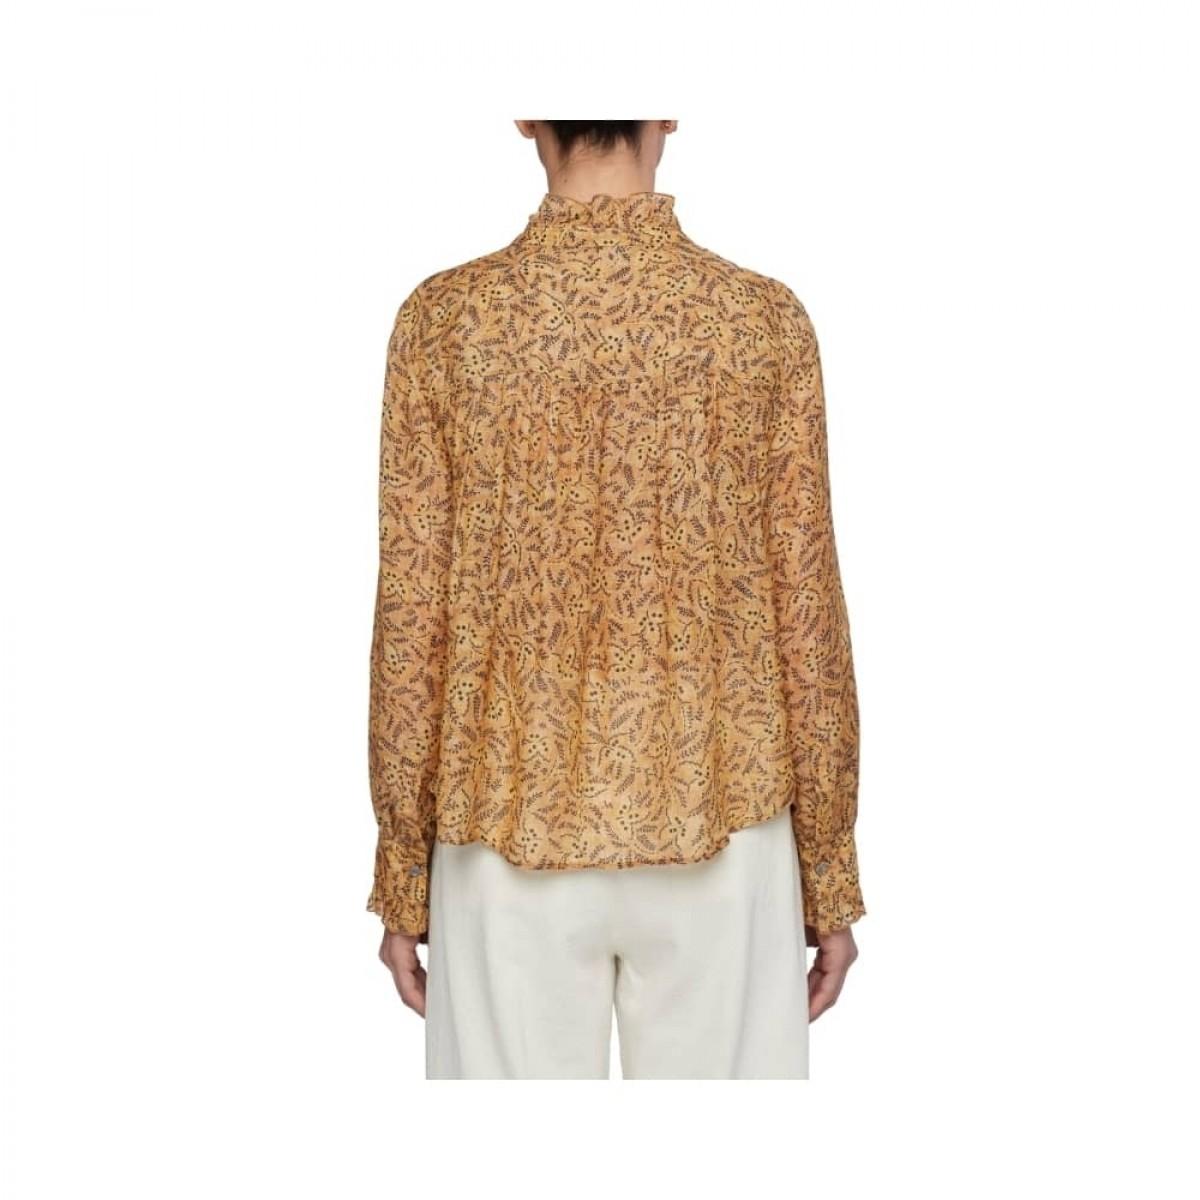 printet pomandére skjorte - camel -model ryg